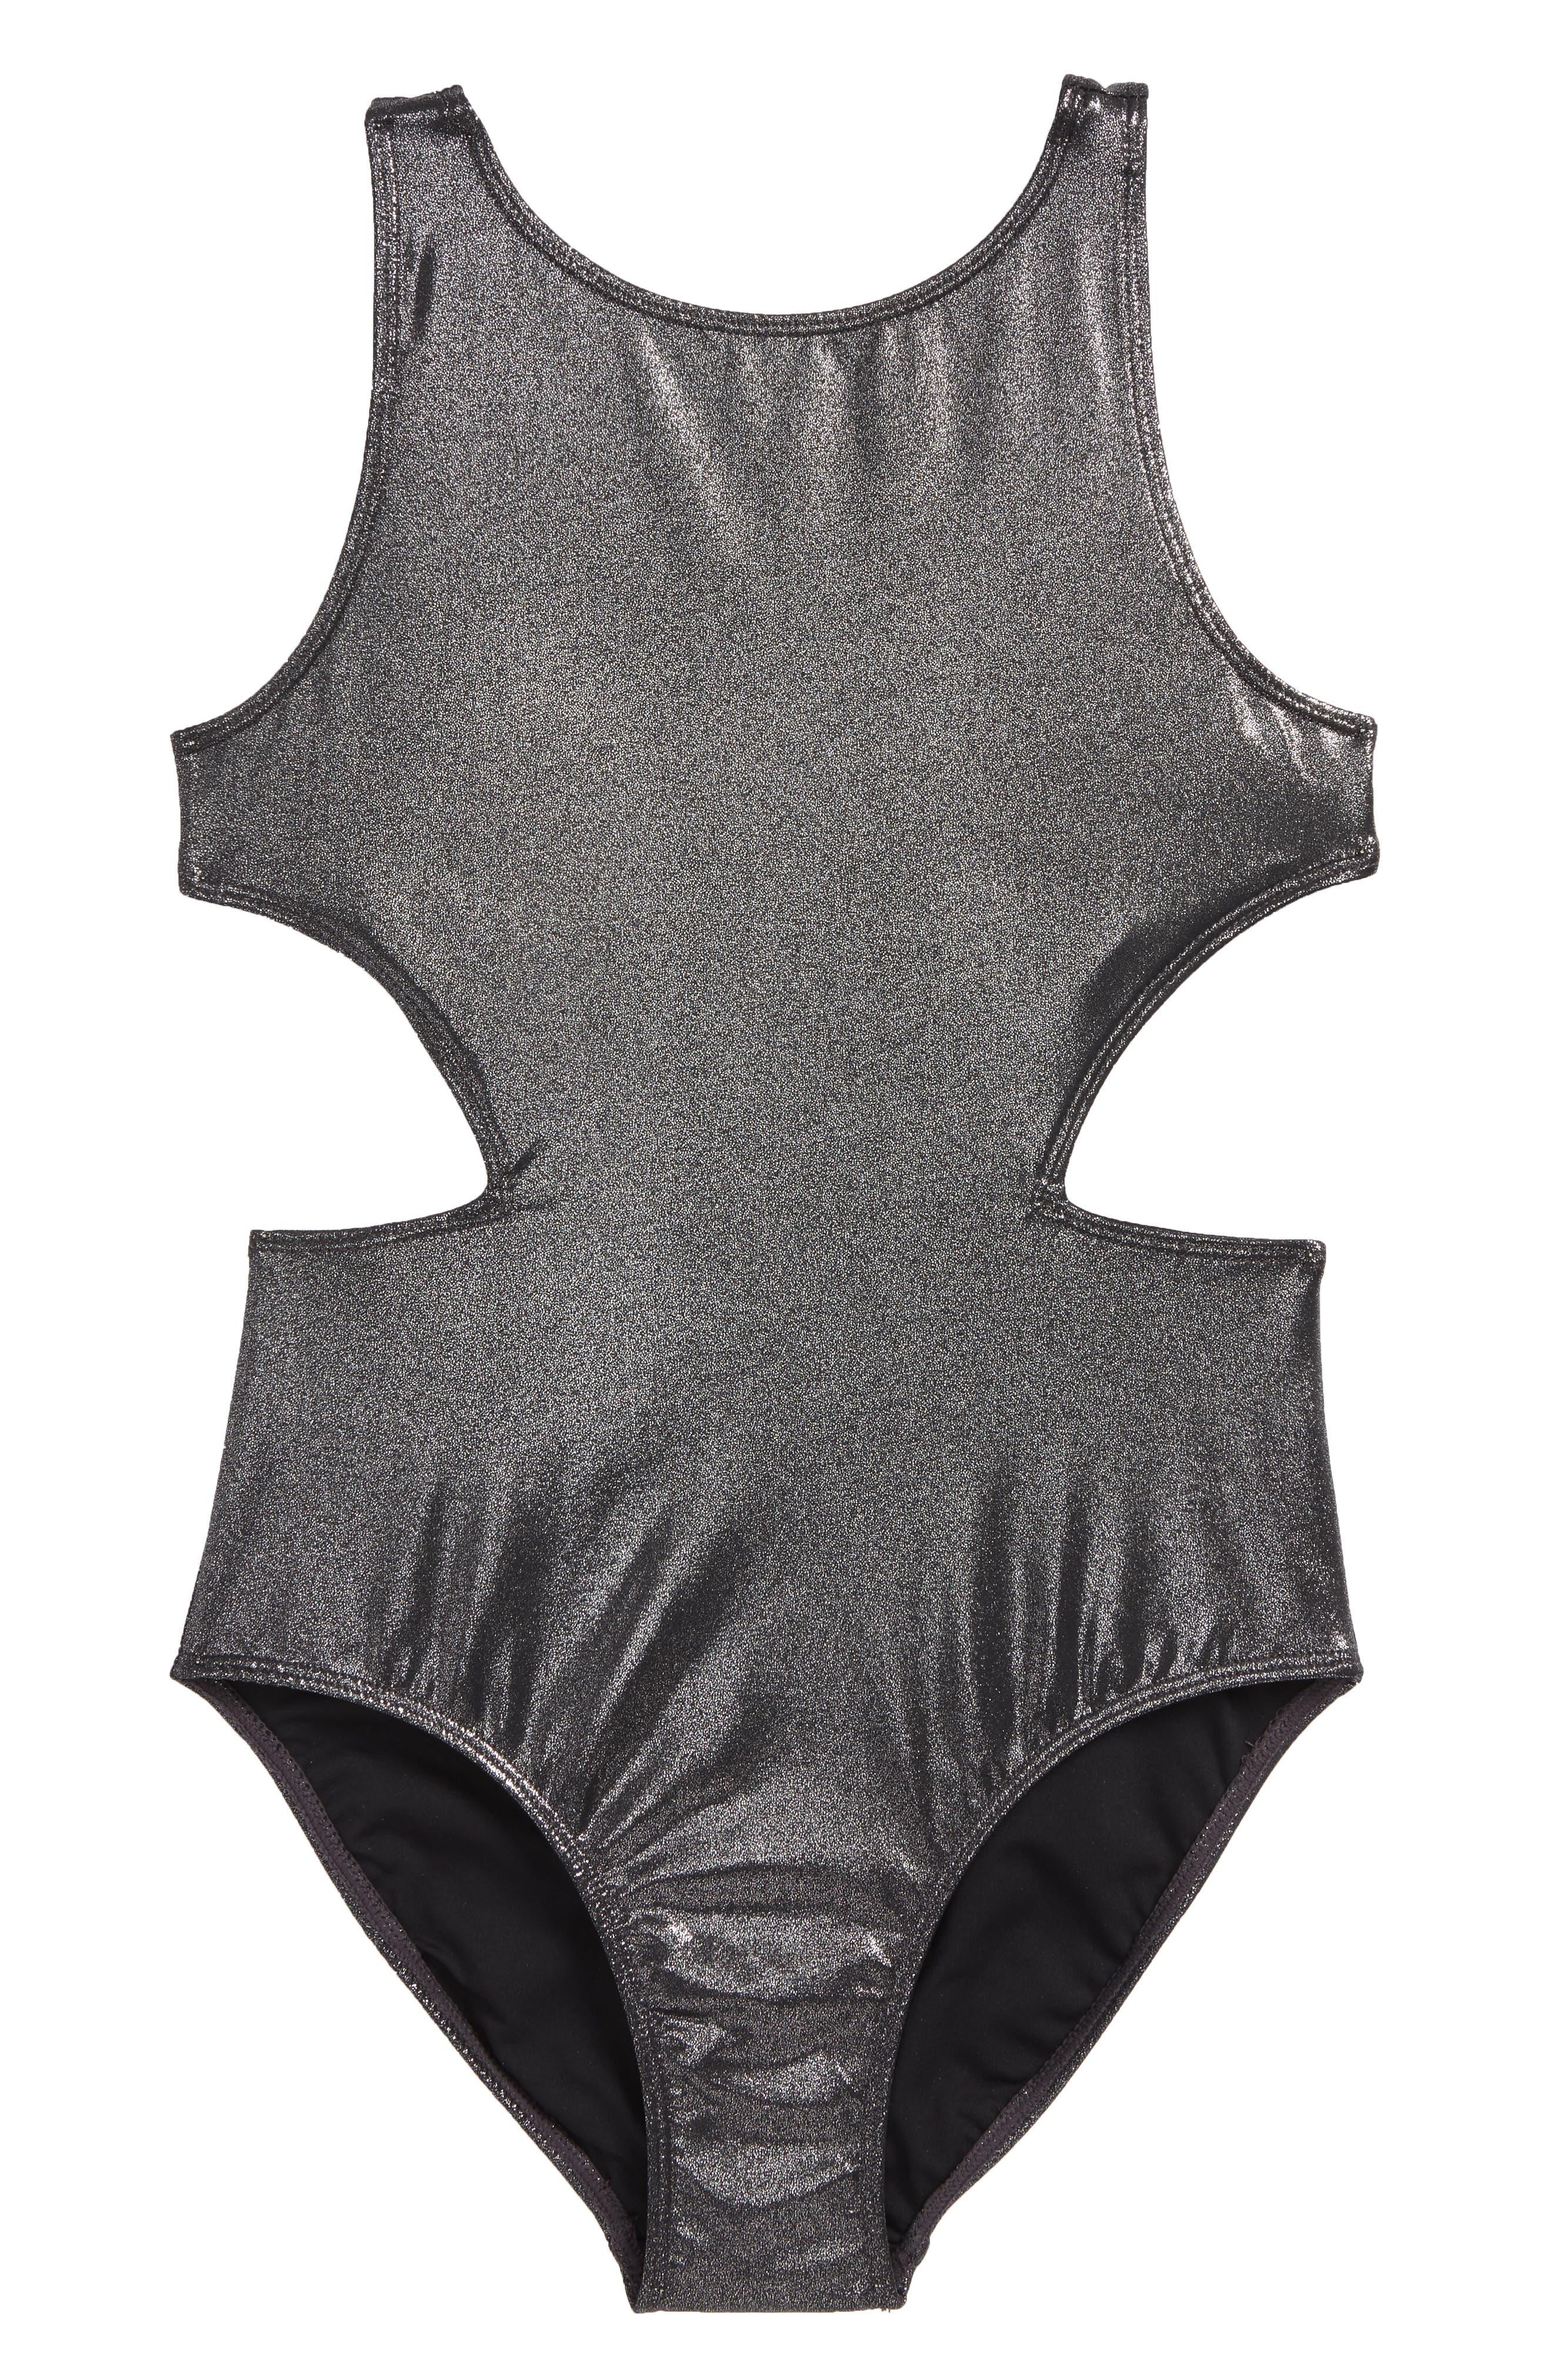 Shine One-Piece Swimsuit,                             Main thumbnail 1, color,                             Silver- Black Metallic